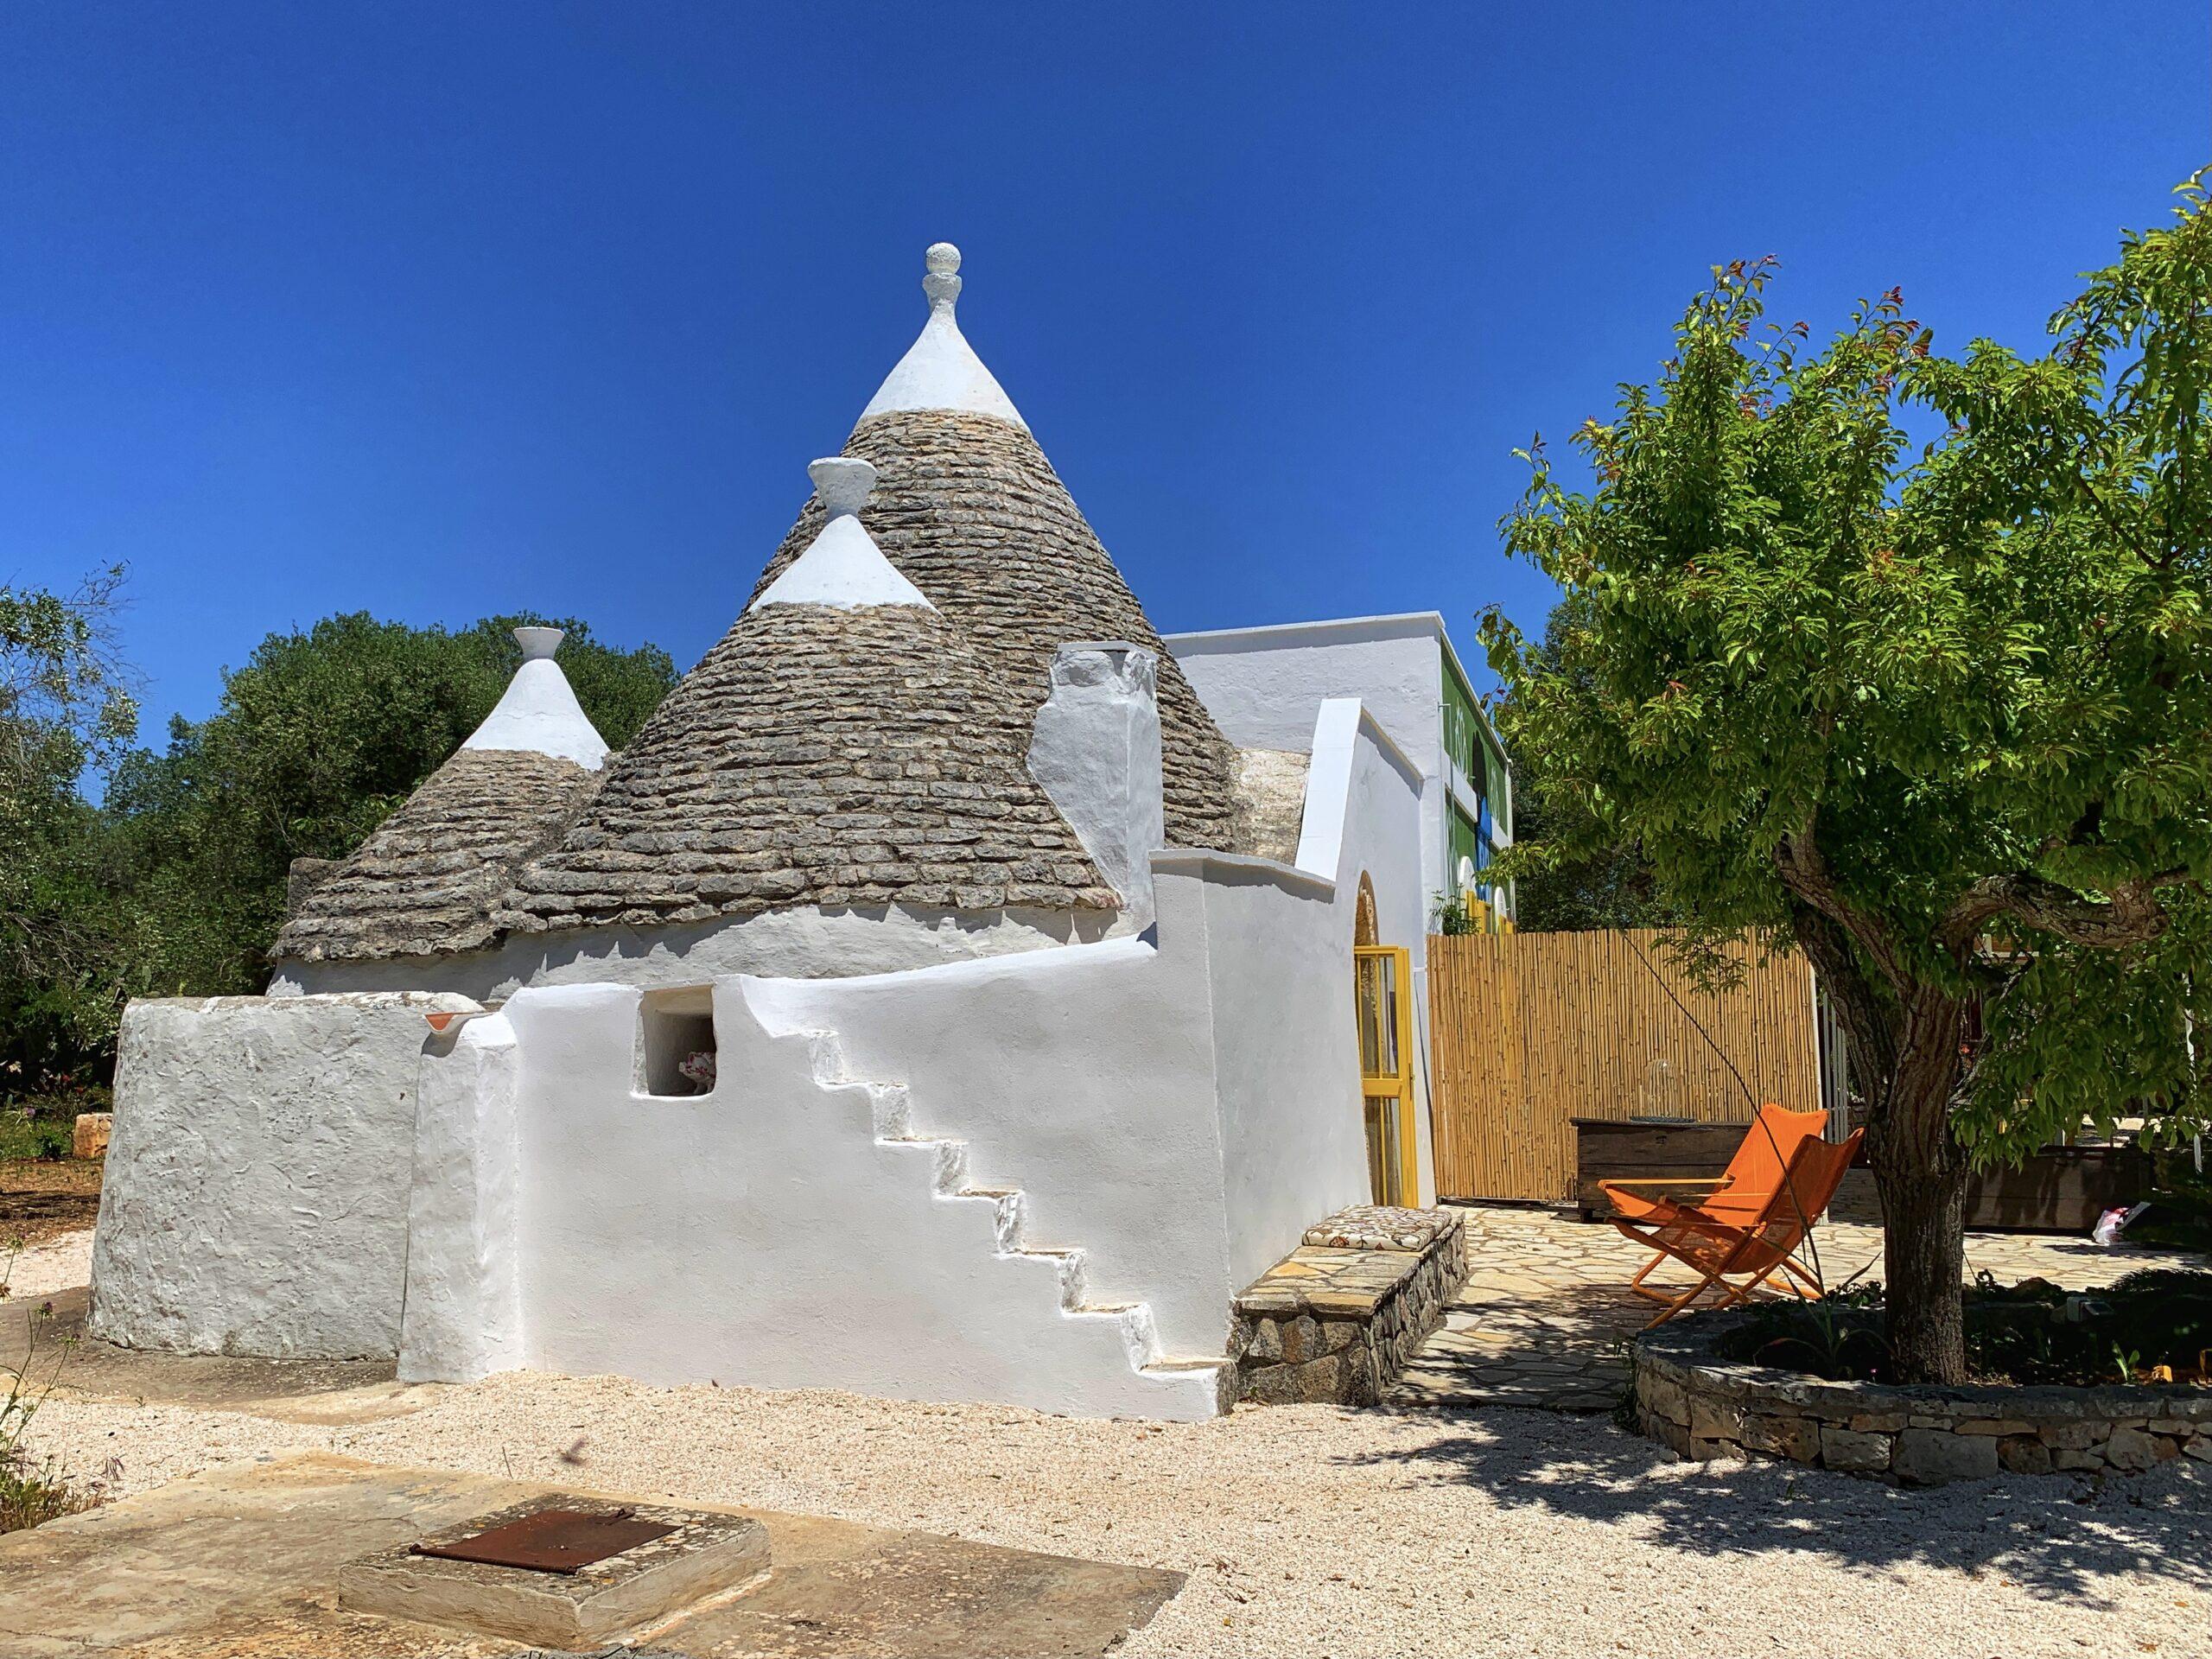 Trulli of Puglia best accommodation in Puglia Guide   Photo The Big Gay Podcast from Puglia